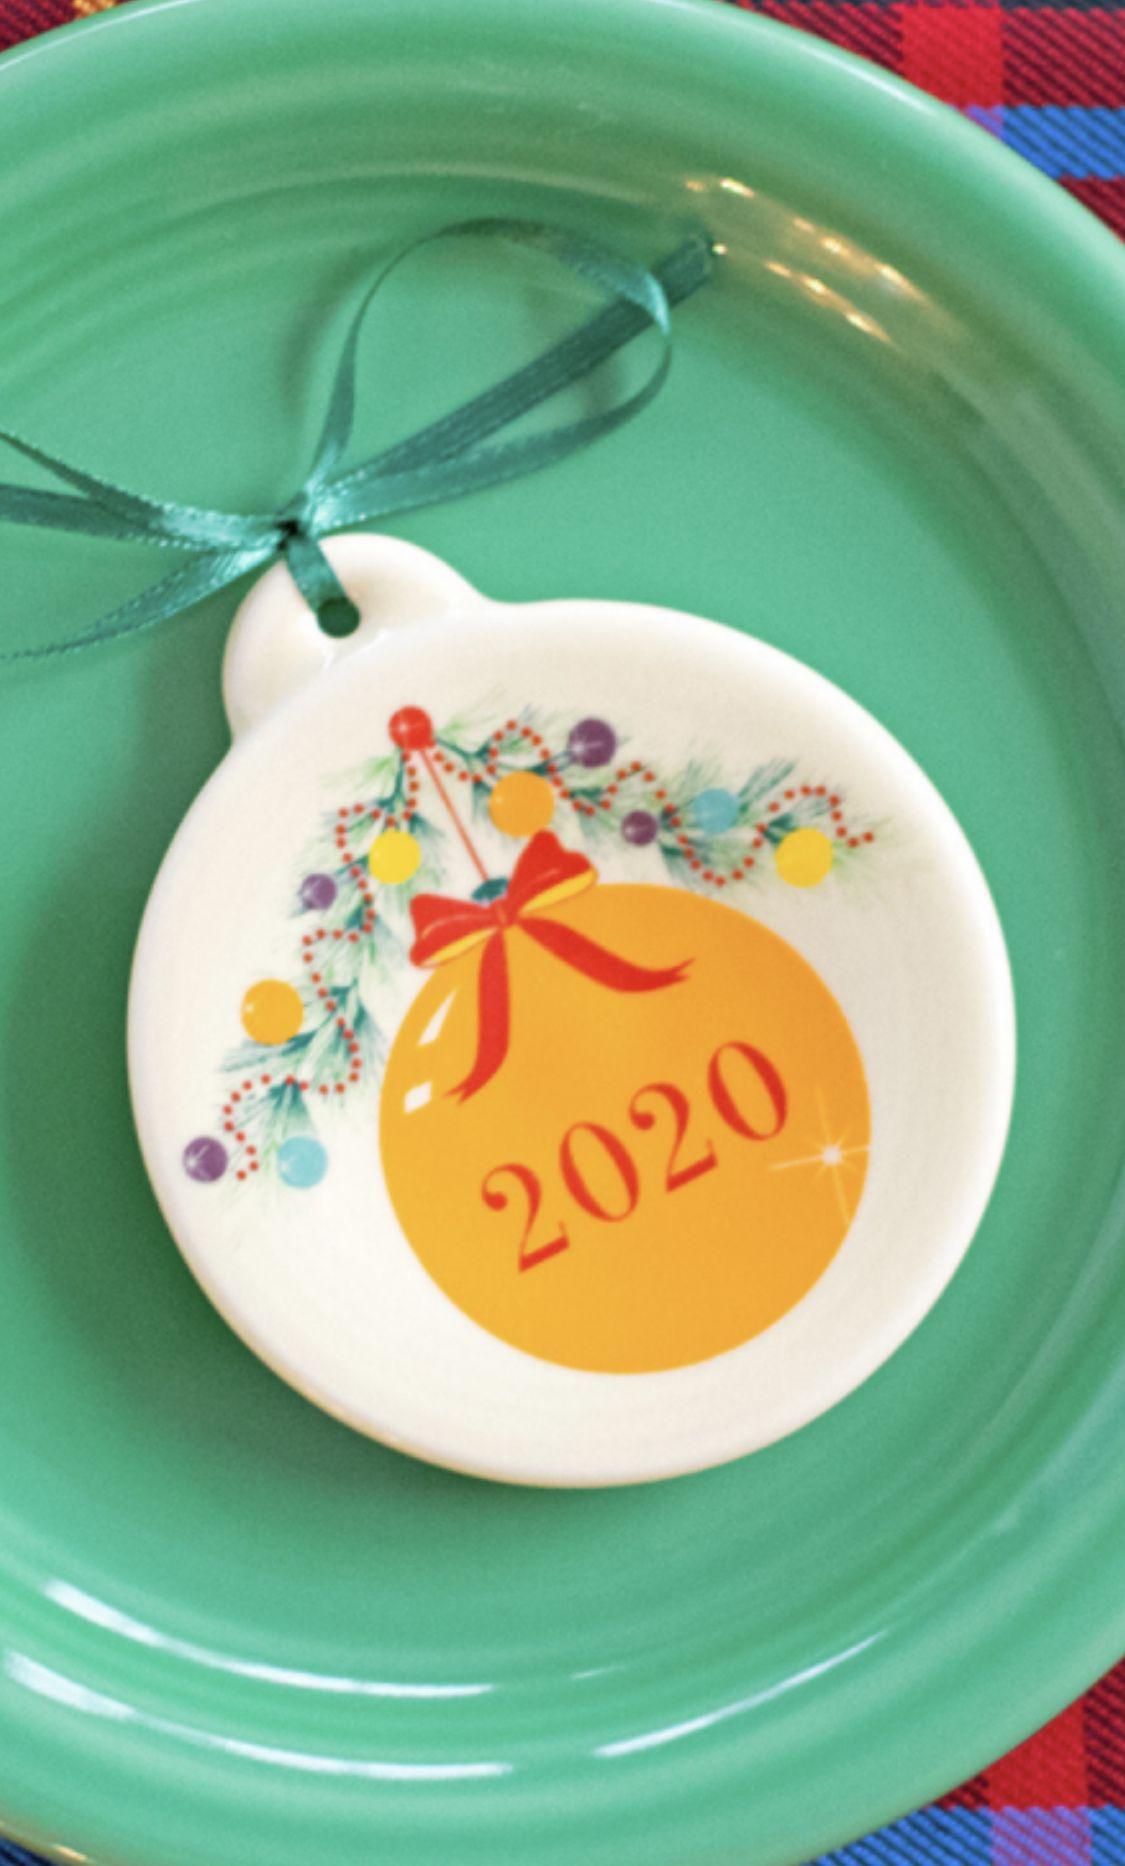 Fiesta 2020 Christmas Ornament Fiesta Christmas Tree Ornament 2020 in 2020 | Fiesta dinnerware